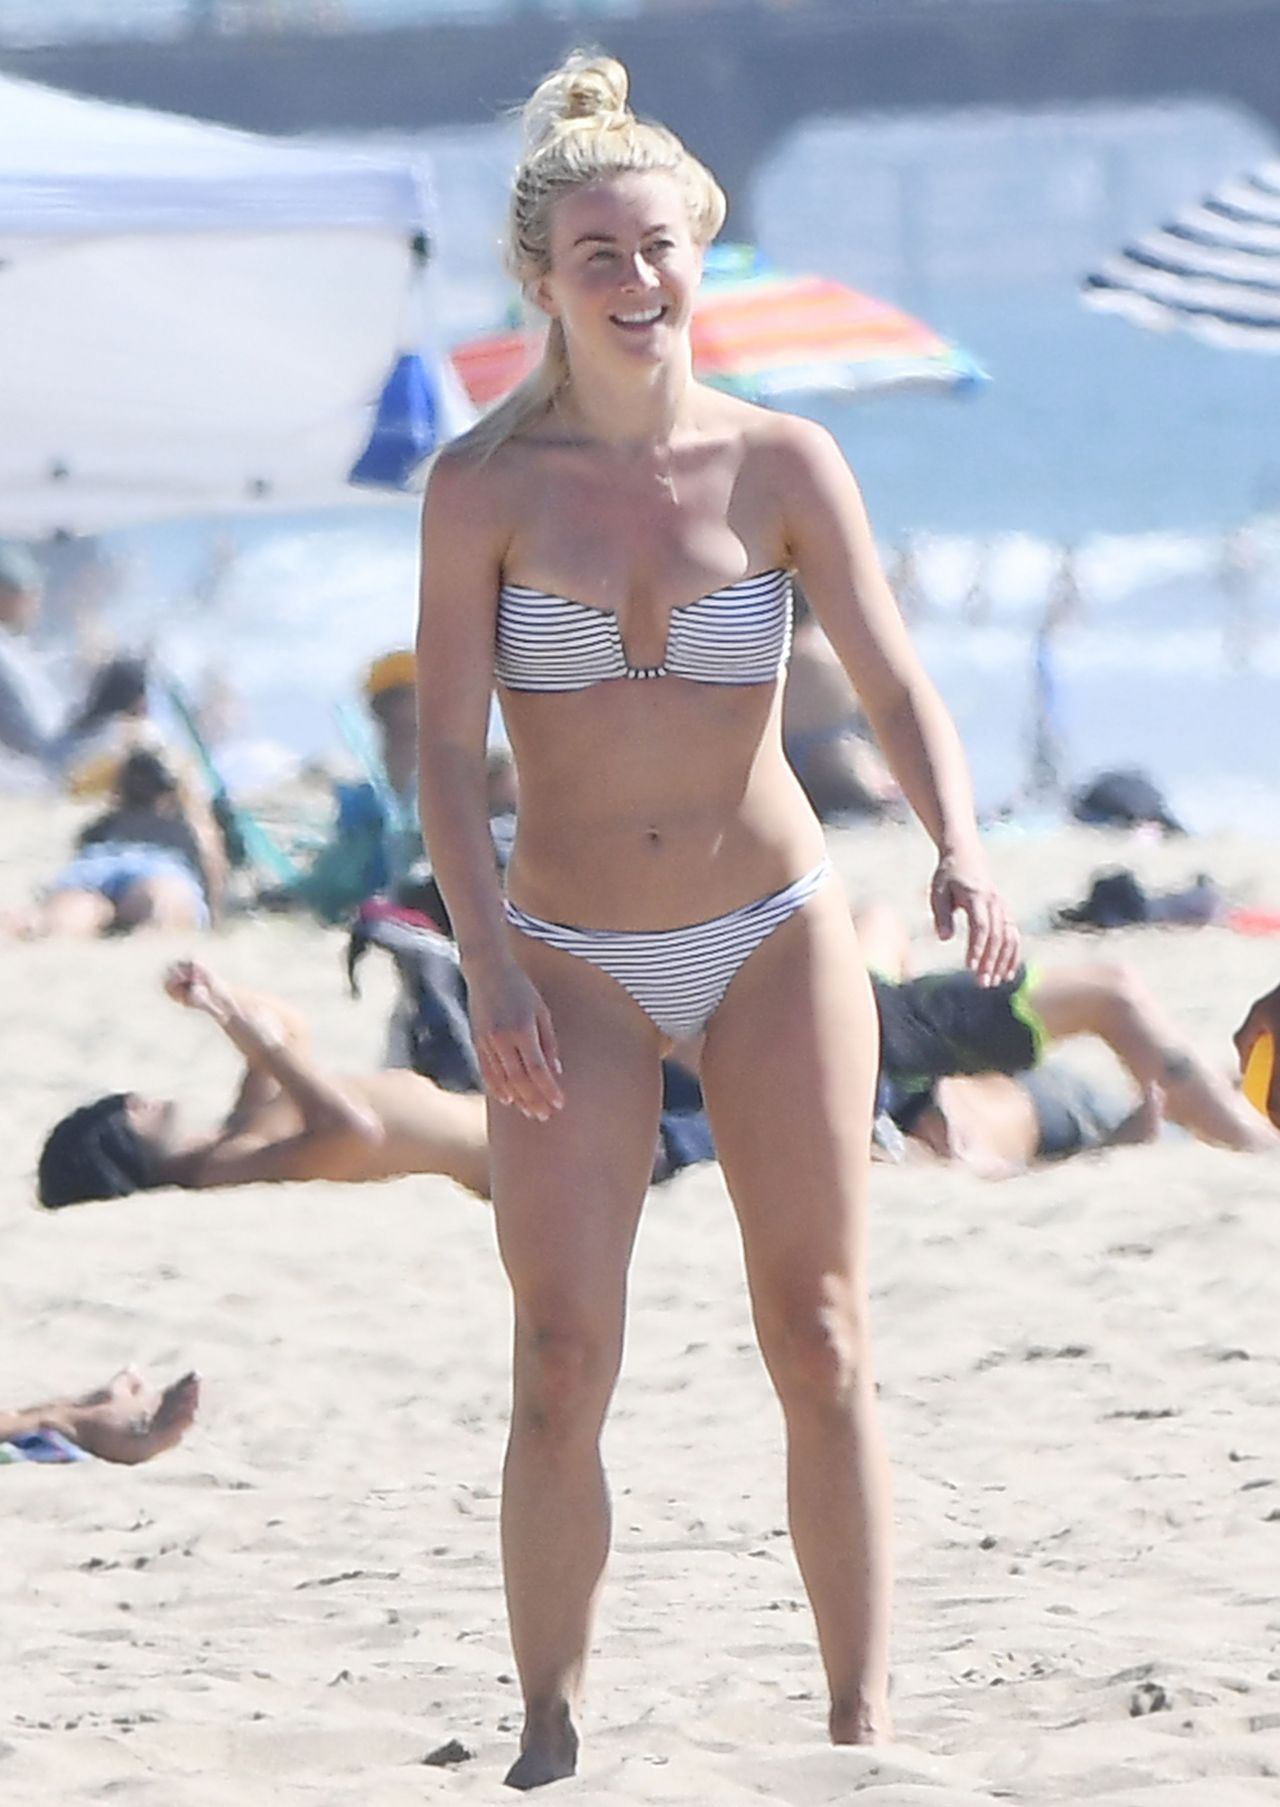 Bikini Julianne Hough naked (12 photos), Tits, Paparazzi, Selfie, underwear 2019